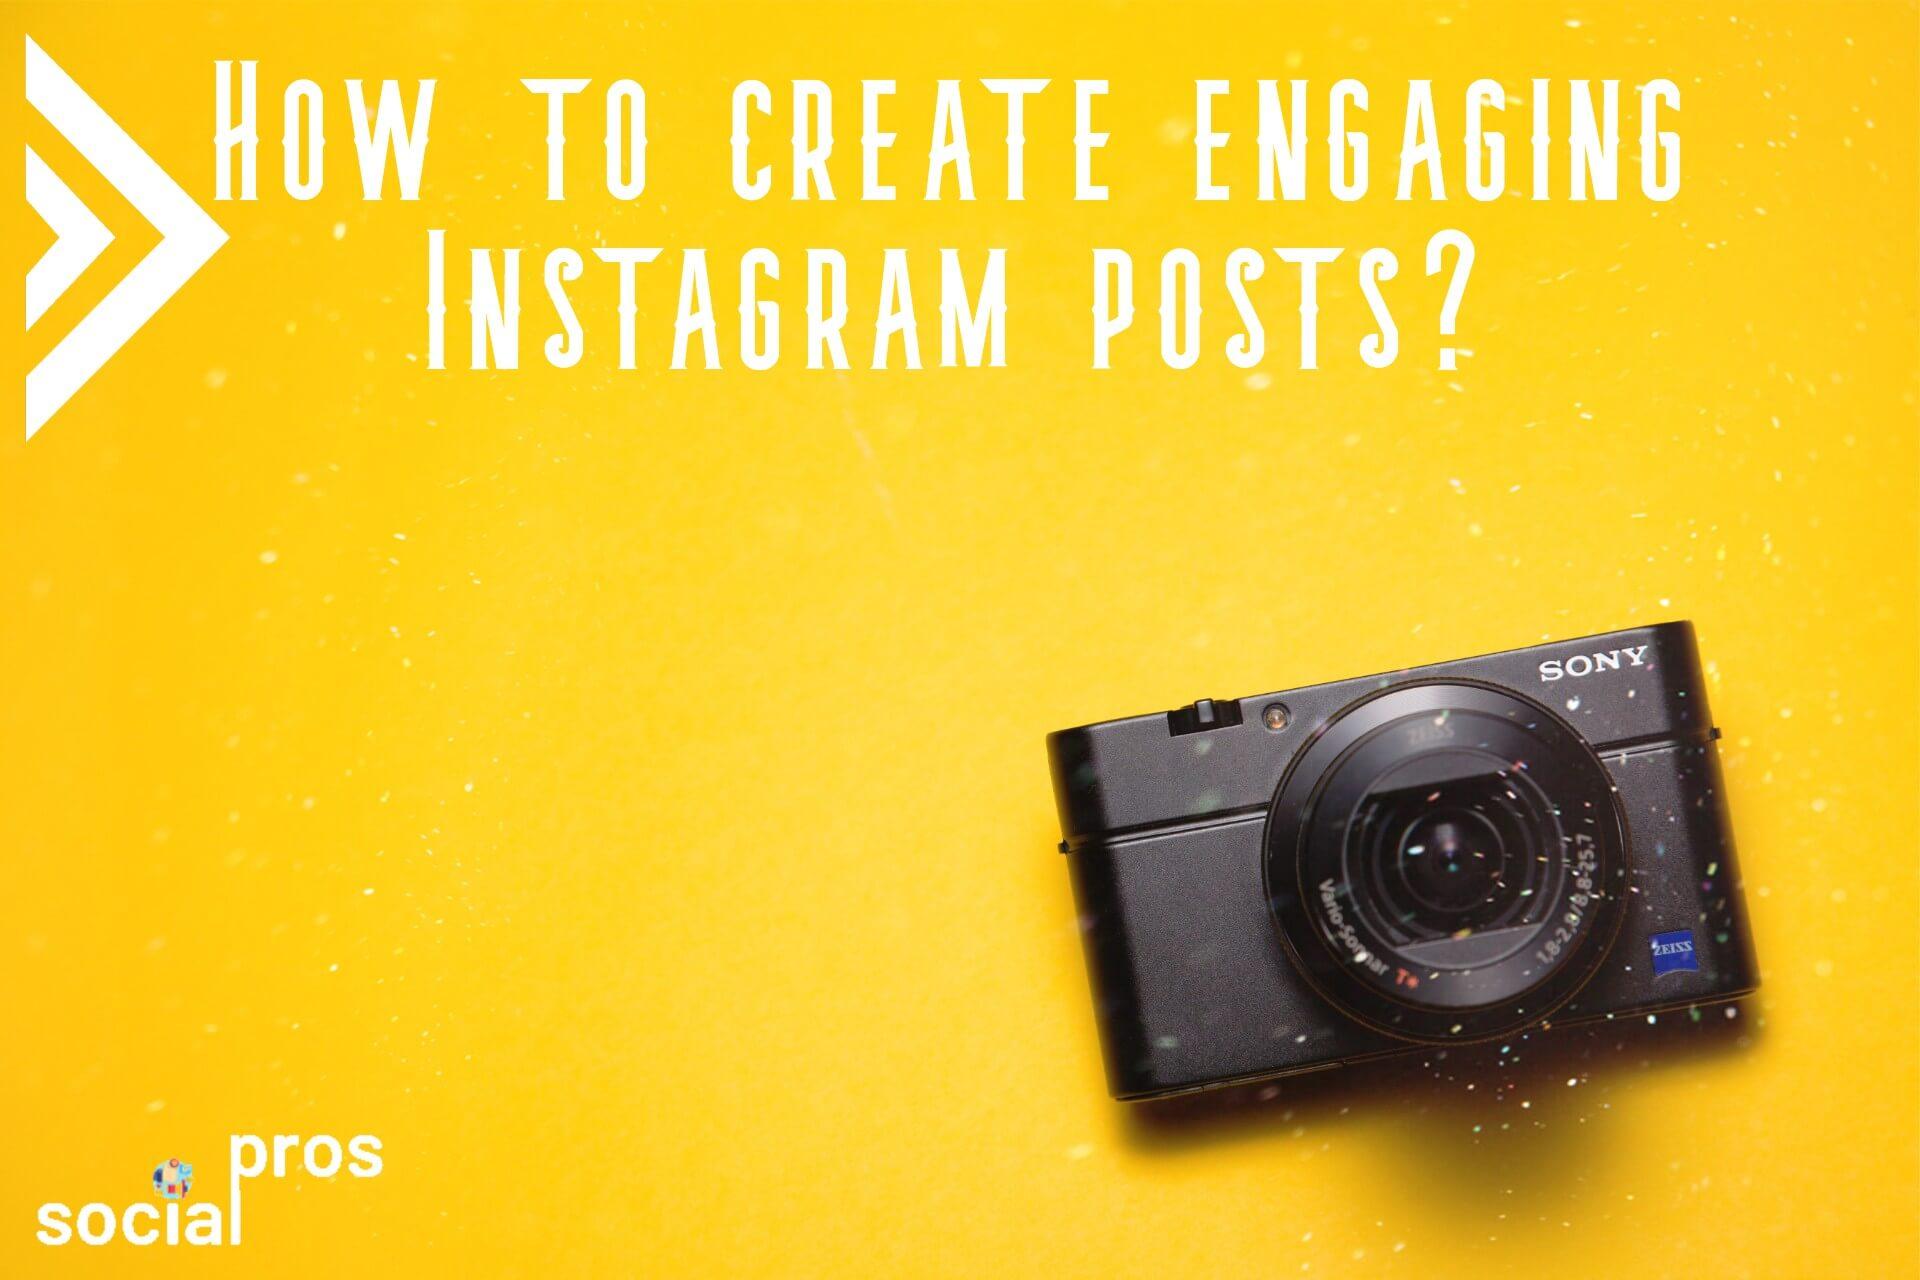 create engaging Instagram posts